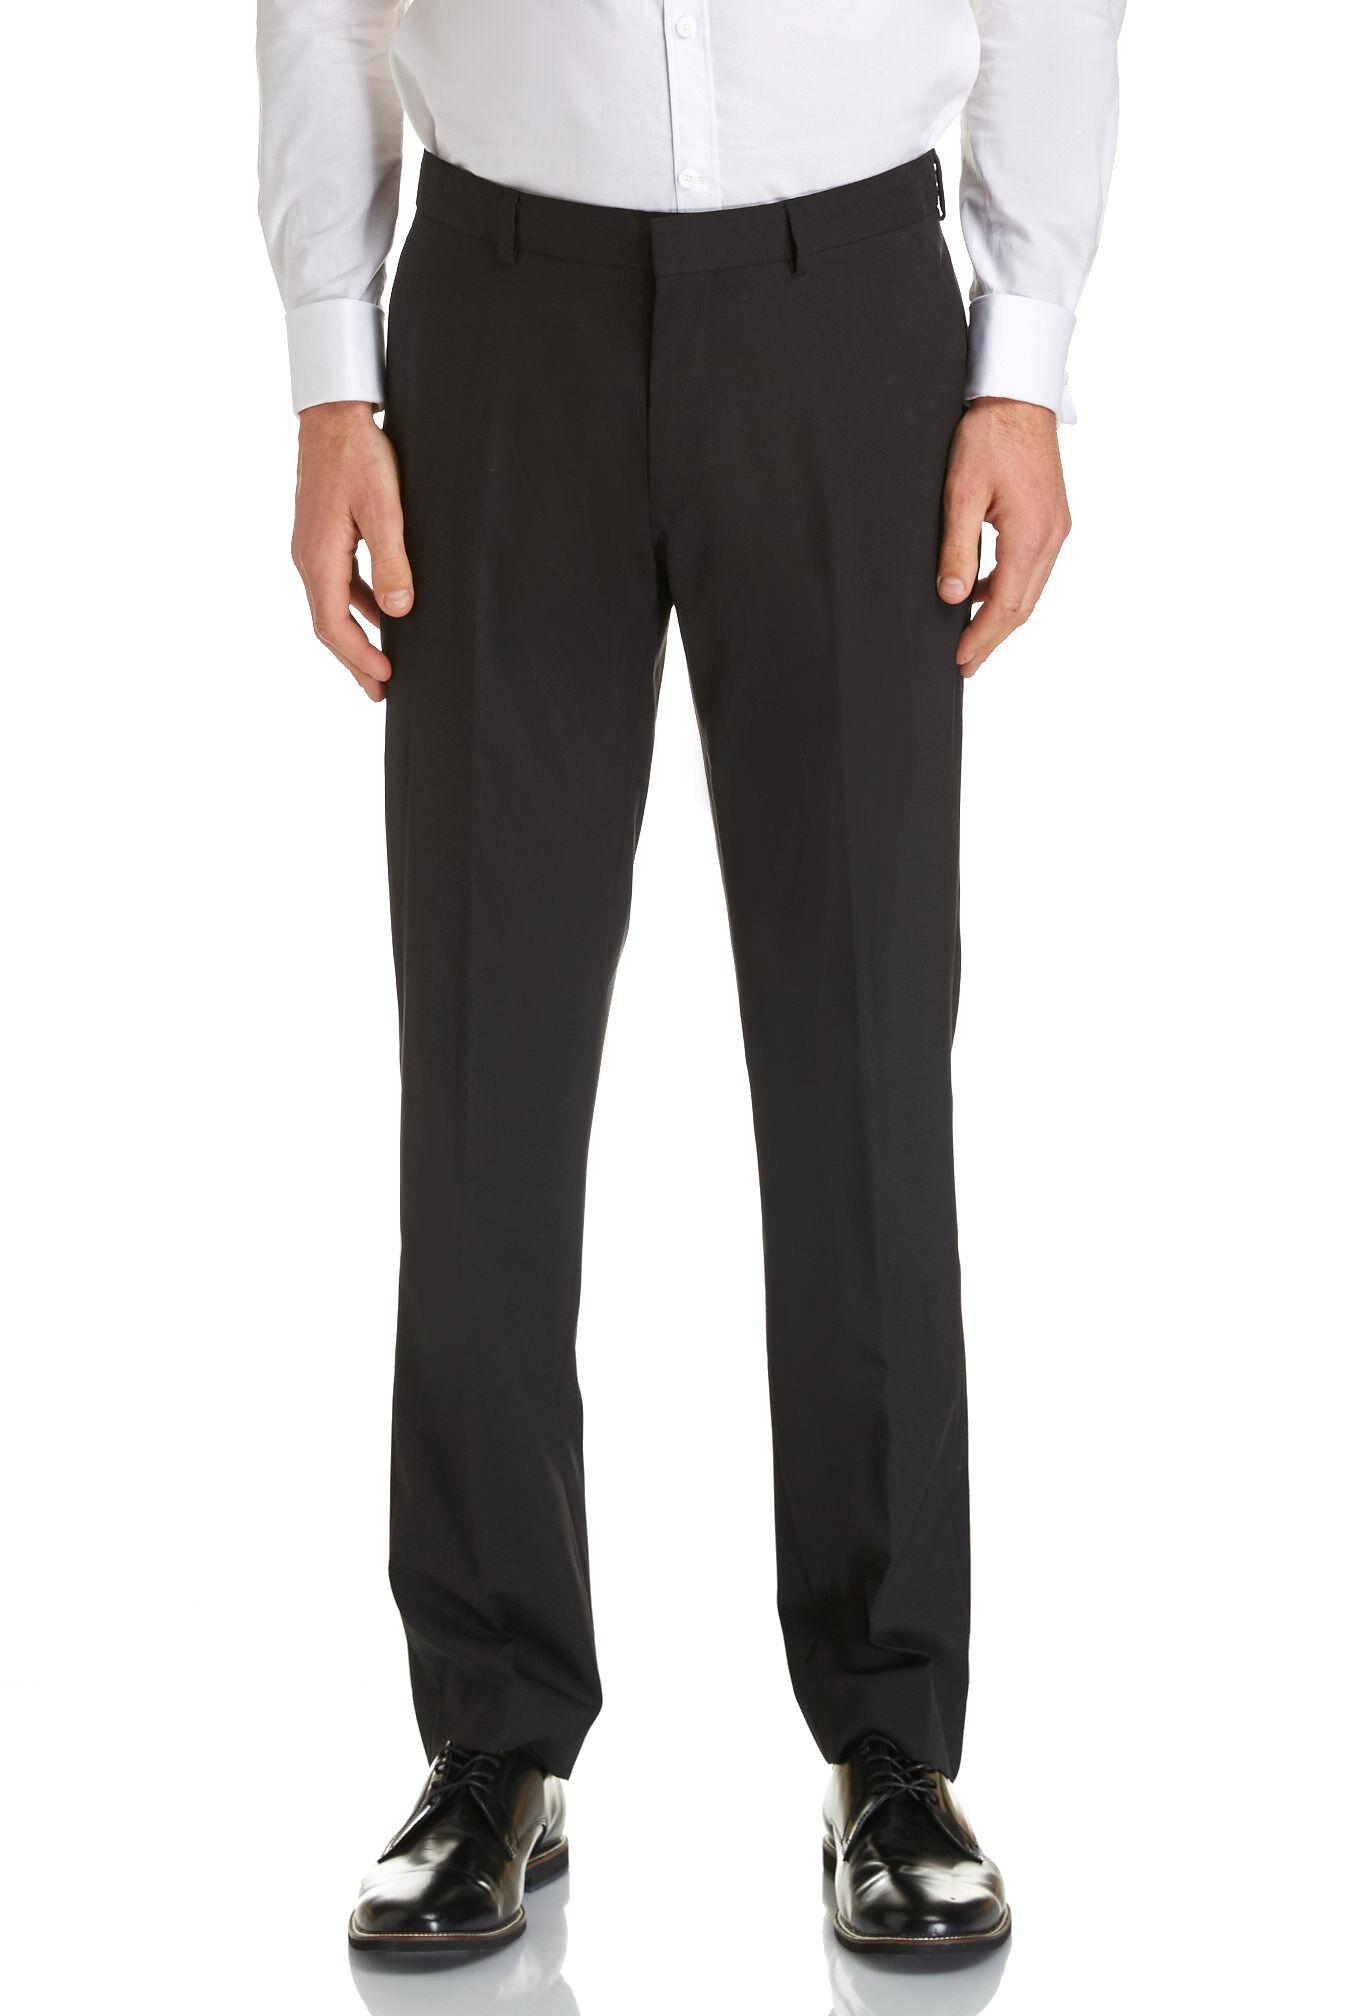 saba contemporary suit pant slimblack34